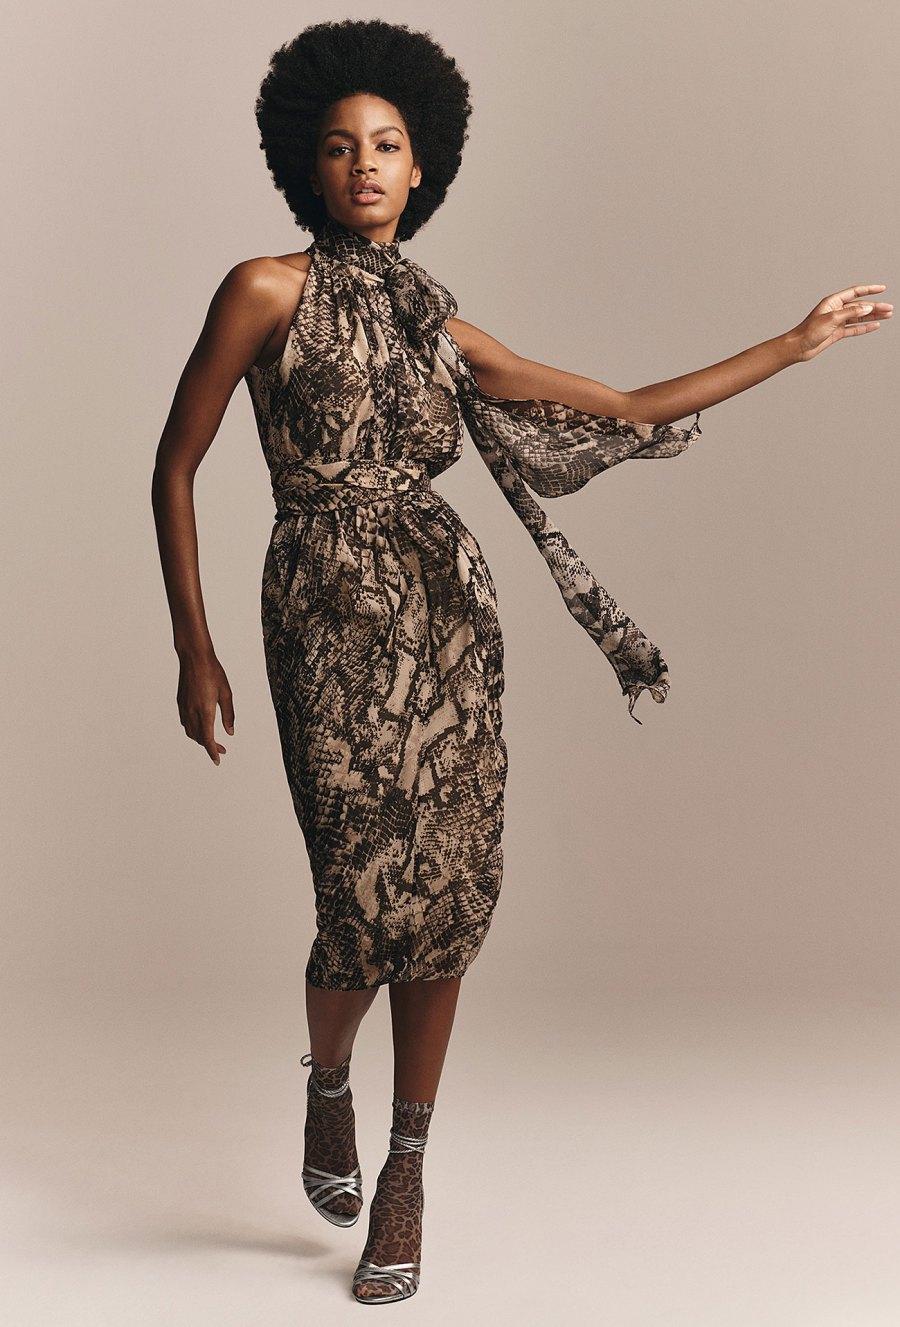 Zendaya x Tommy Hilfiger Collection - Zendaya Snake Print Halter Neck Dress